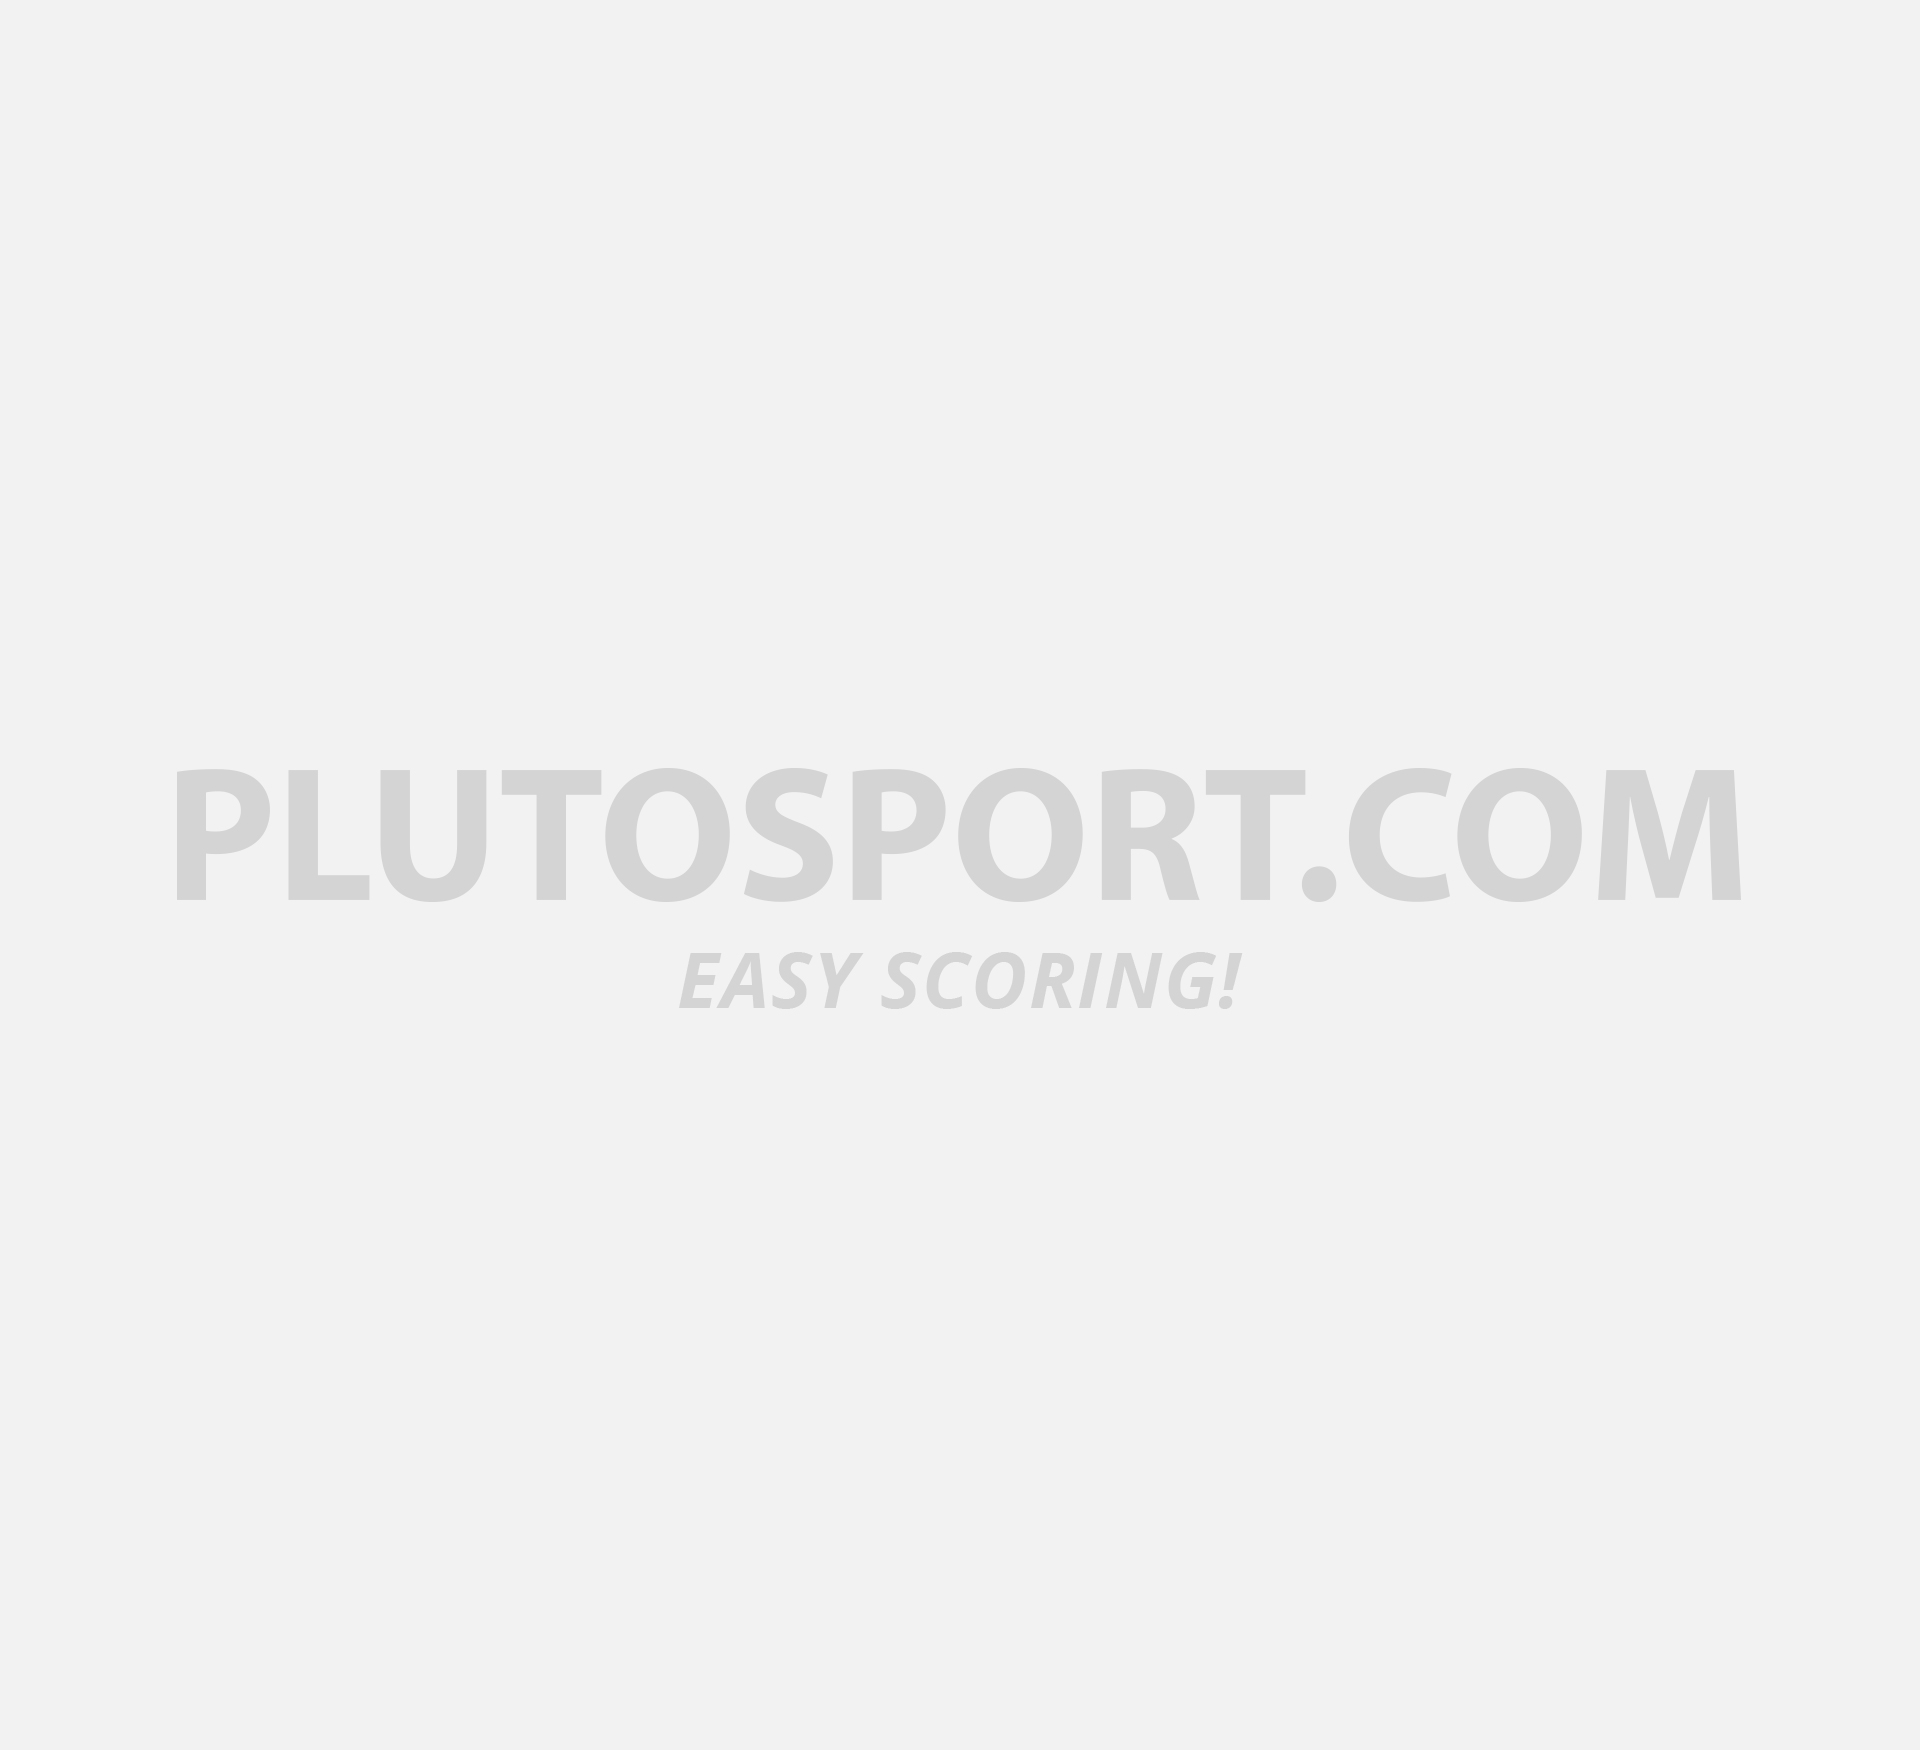 d348b768b91 Reebok Sublite Super Duo 3.0 - Neutral - Shoes - Running - Sports ...